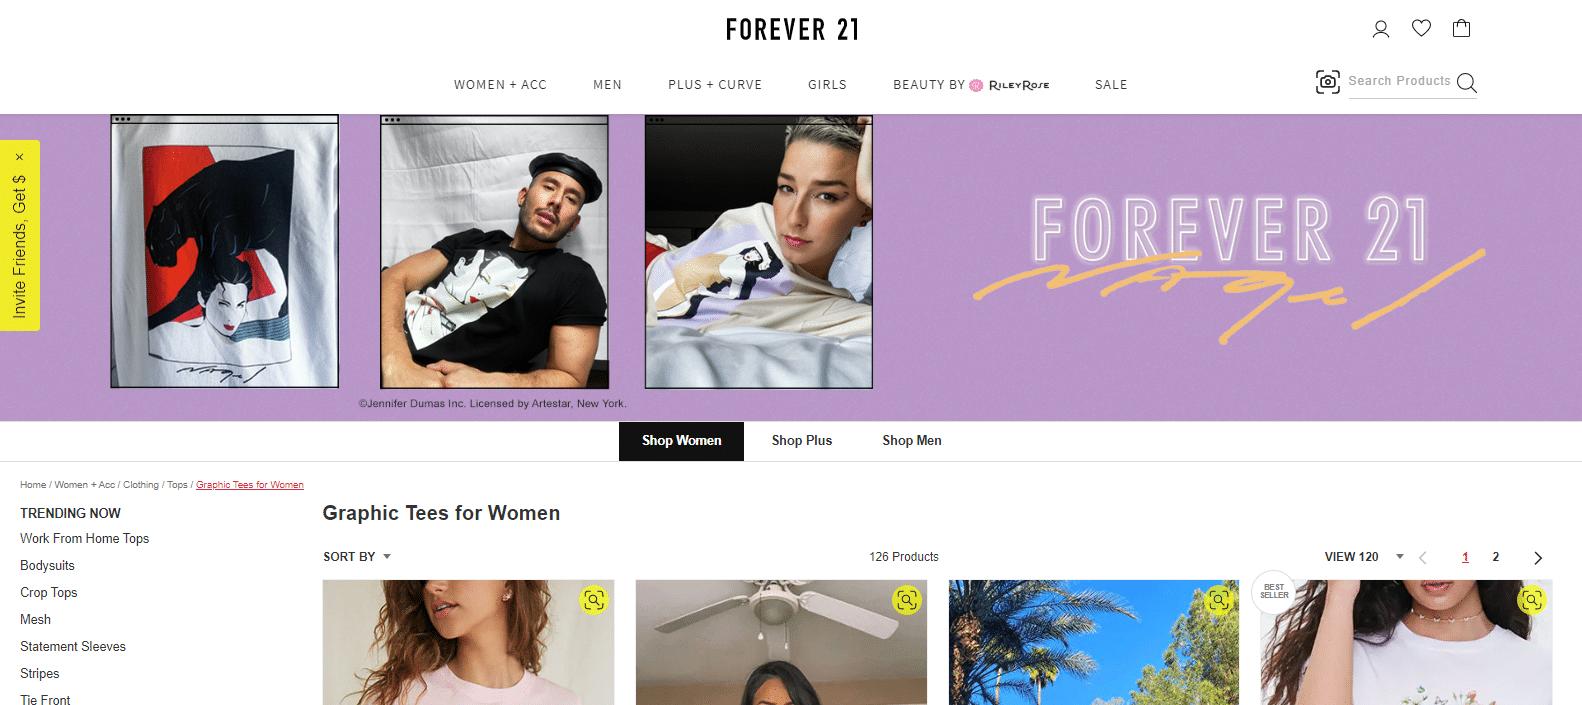 ephemeral content - 3 tips - forever 21 shop